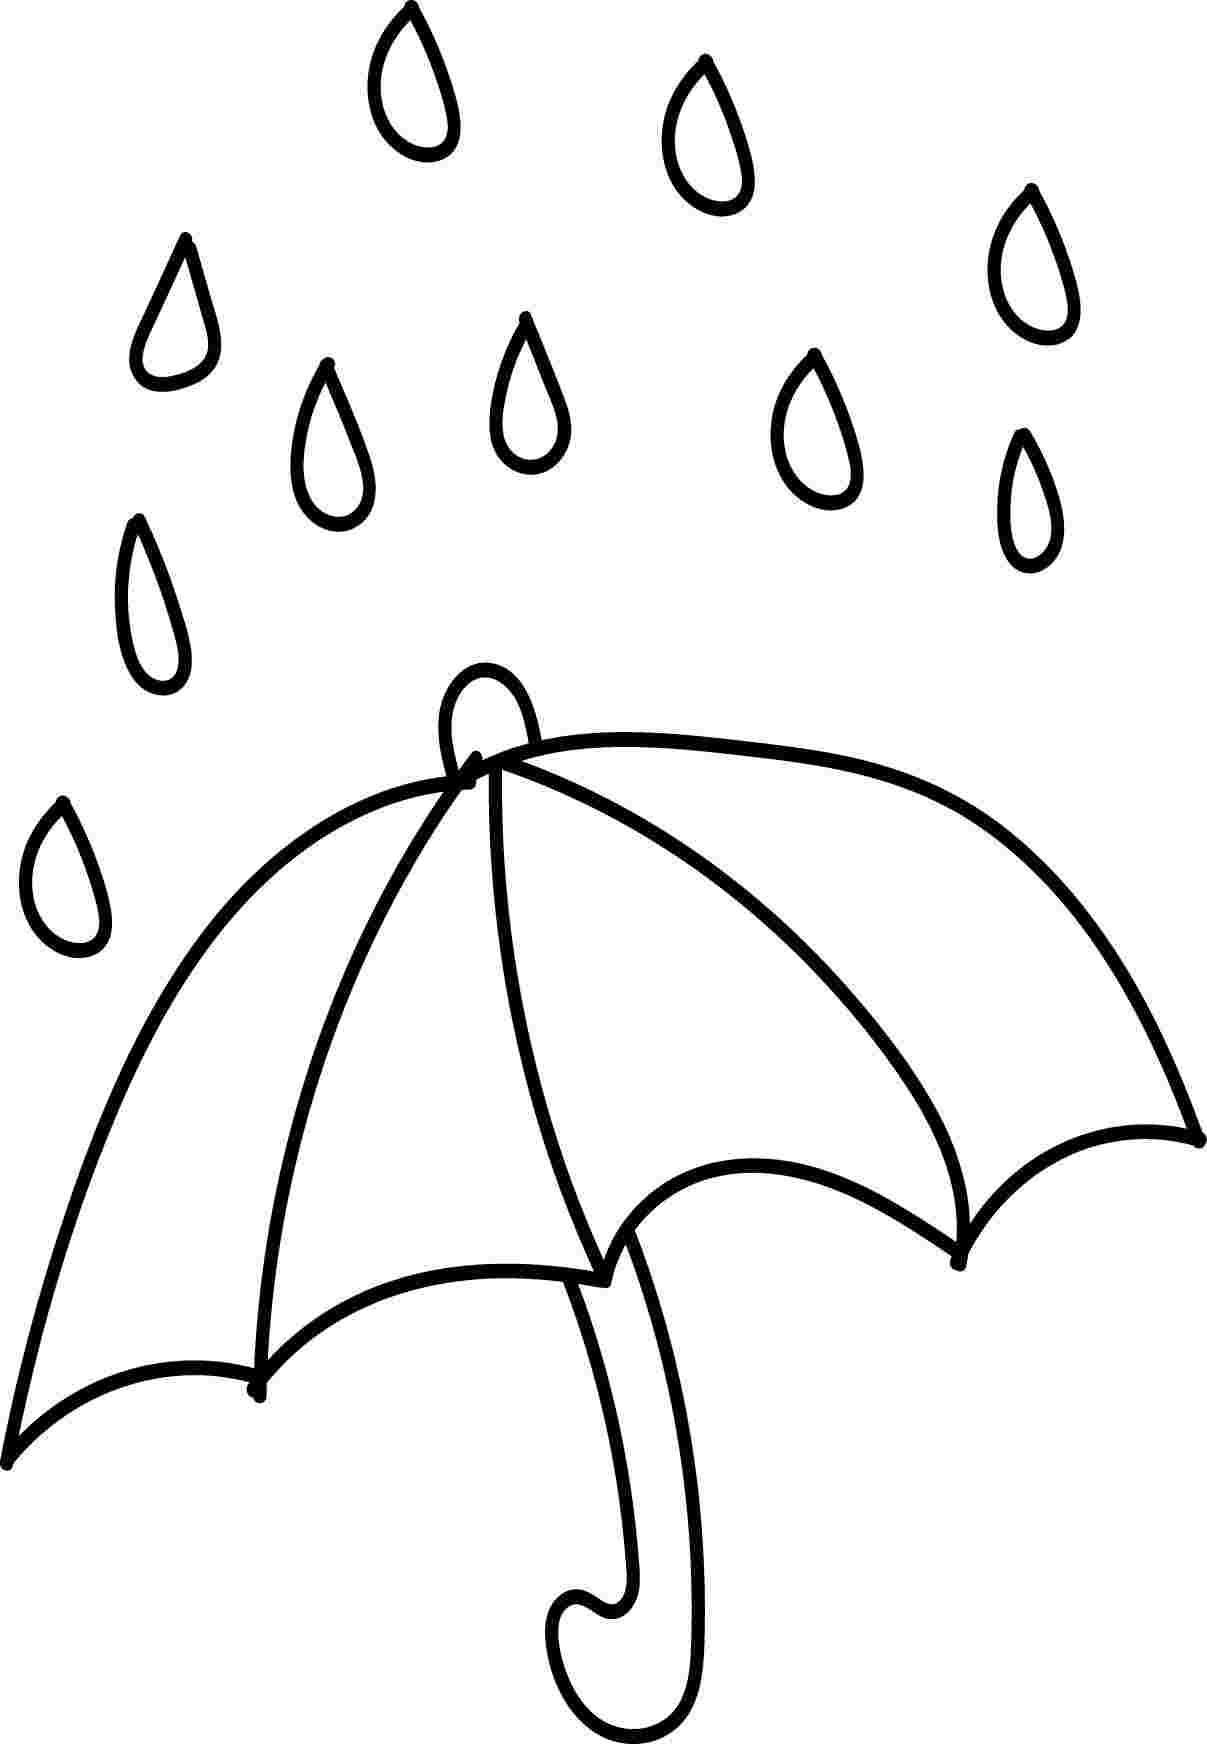 Raindrops Coloring Page : raindrops, coloring, Coloring, Pages, Raindrops, Raindrop, Color